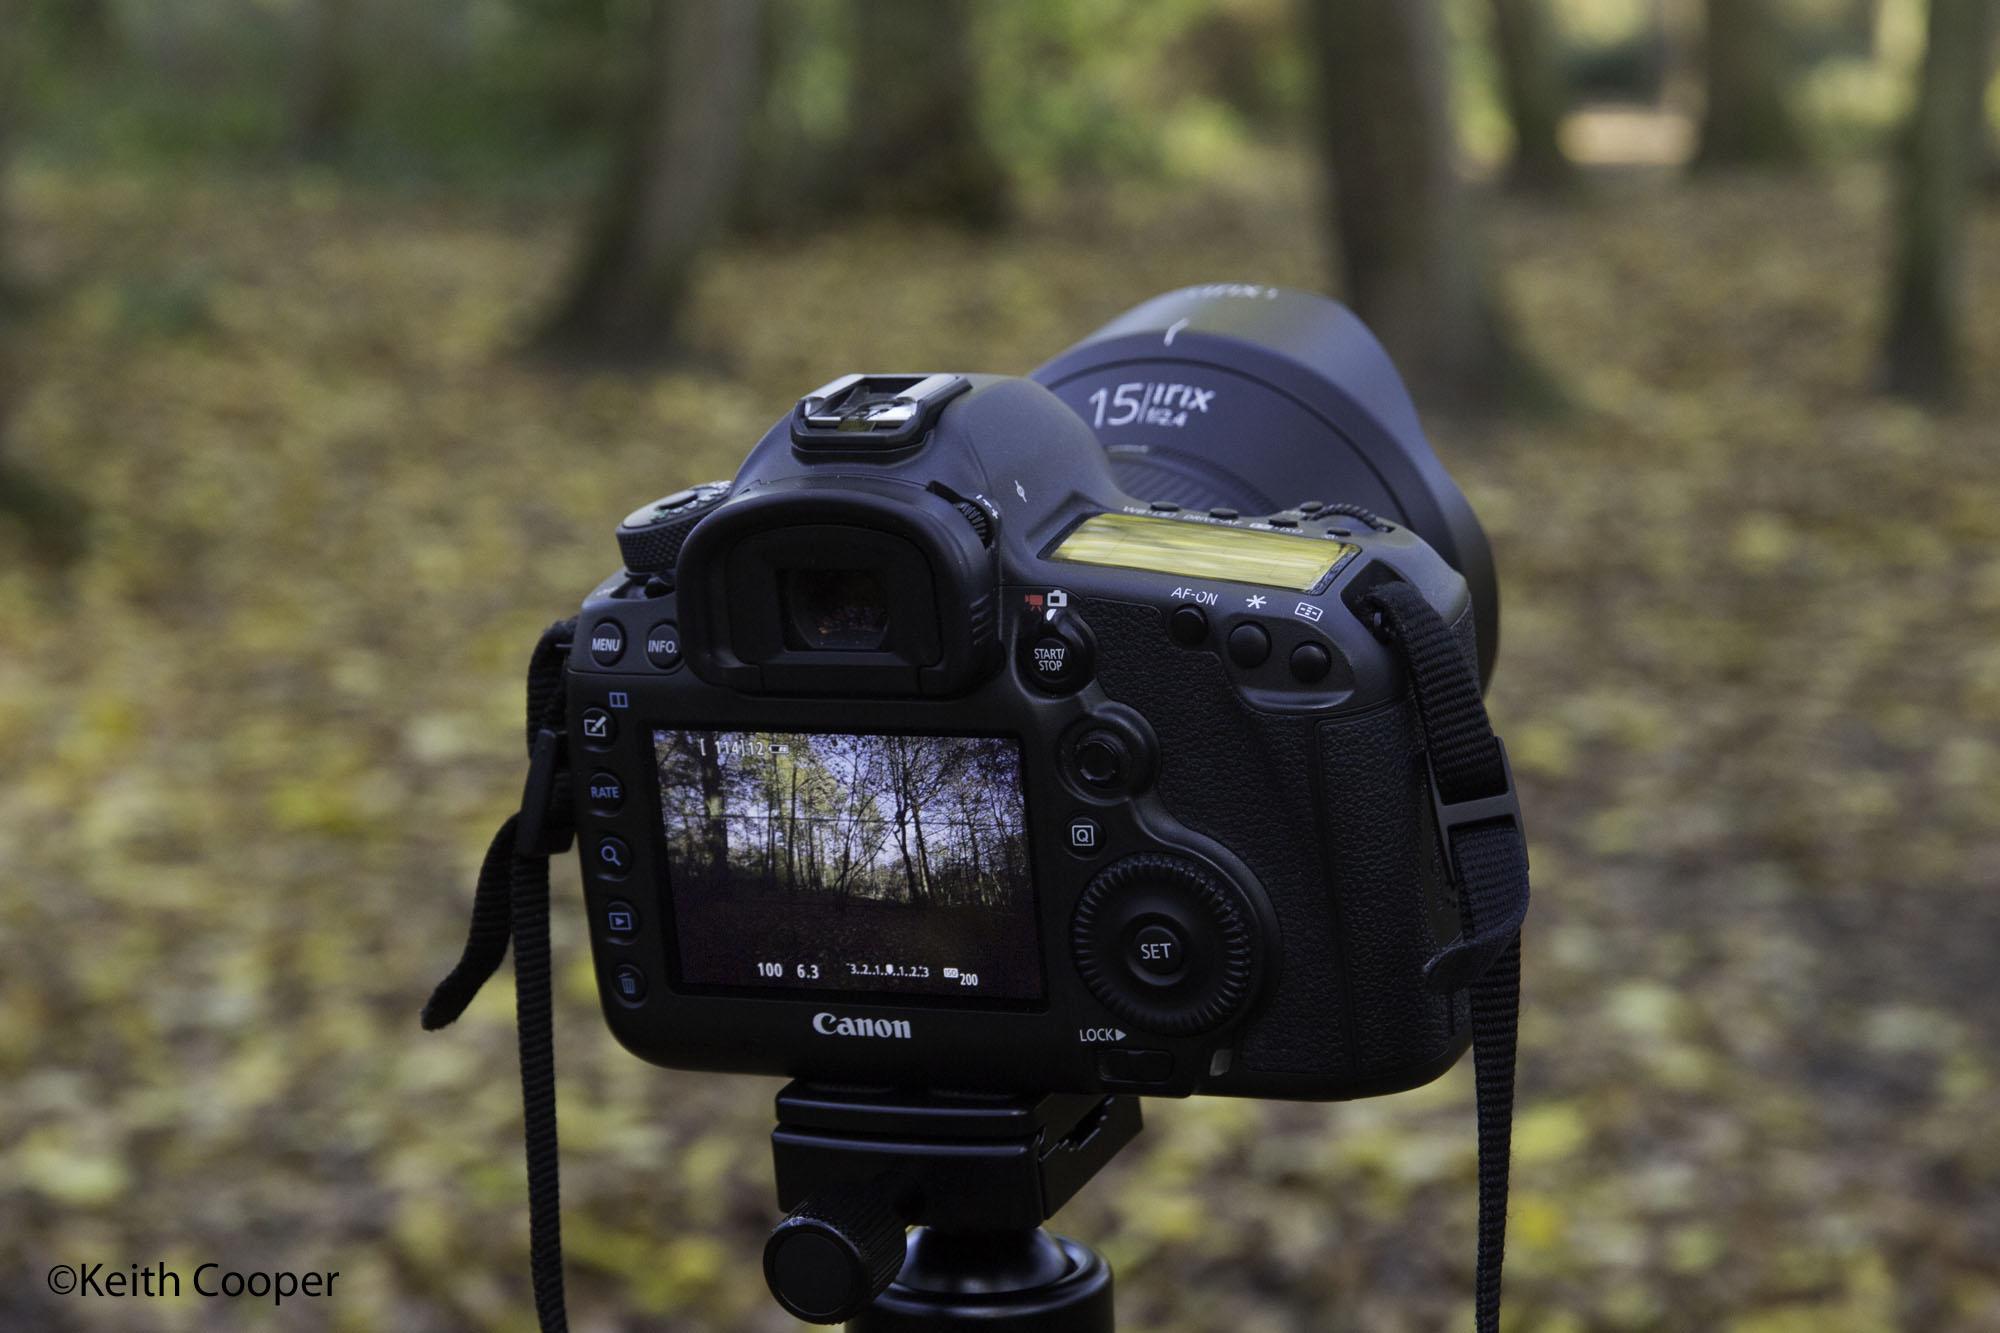 live view irix 15mm